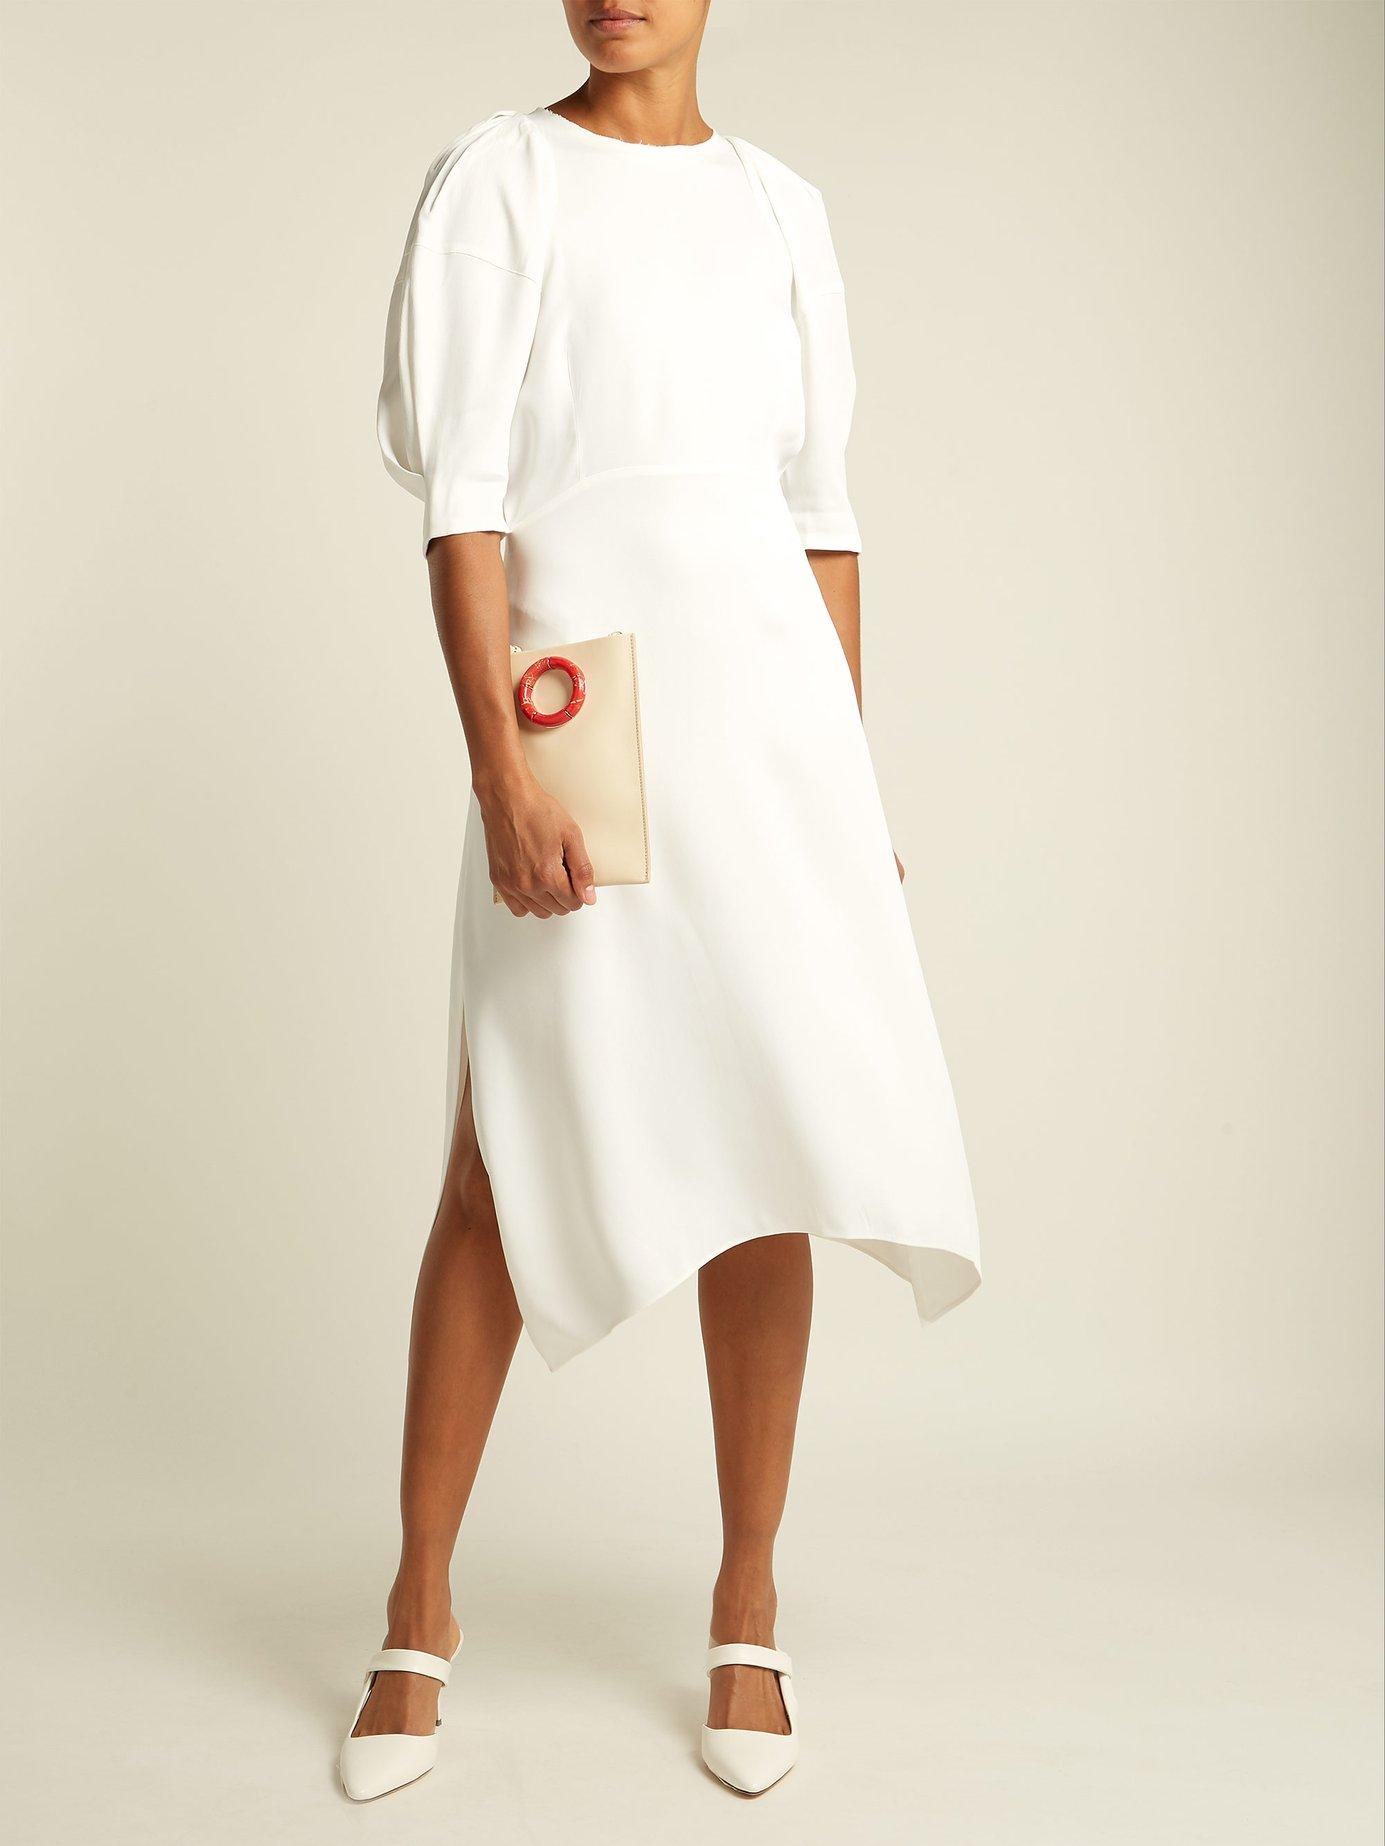 Cynthia puffed-sleeve midi dress by Khaite